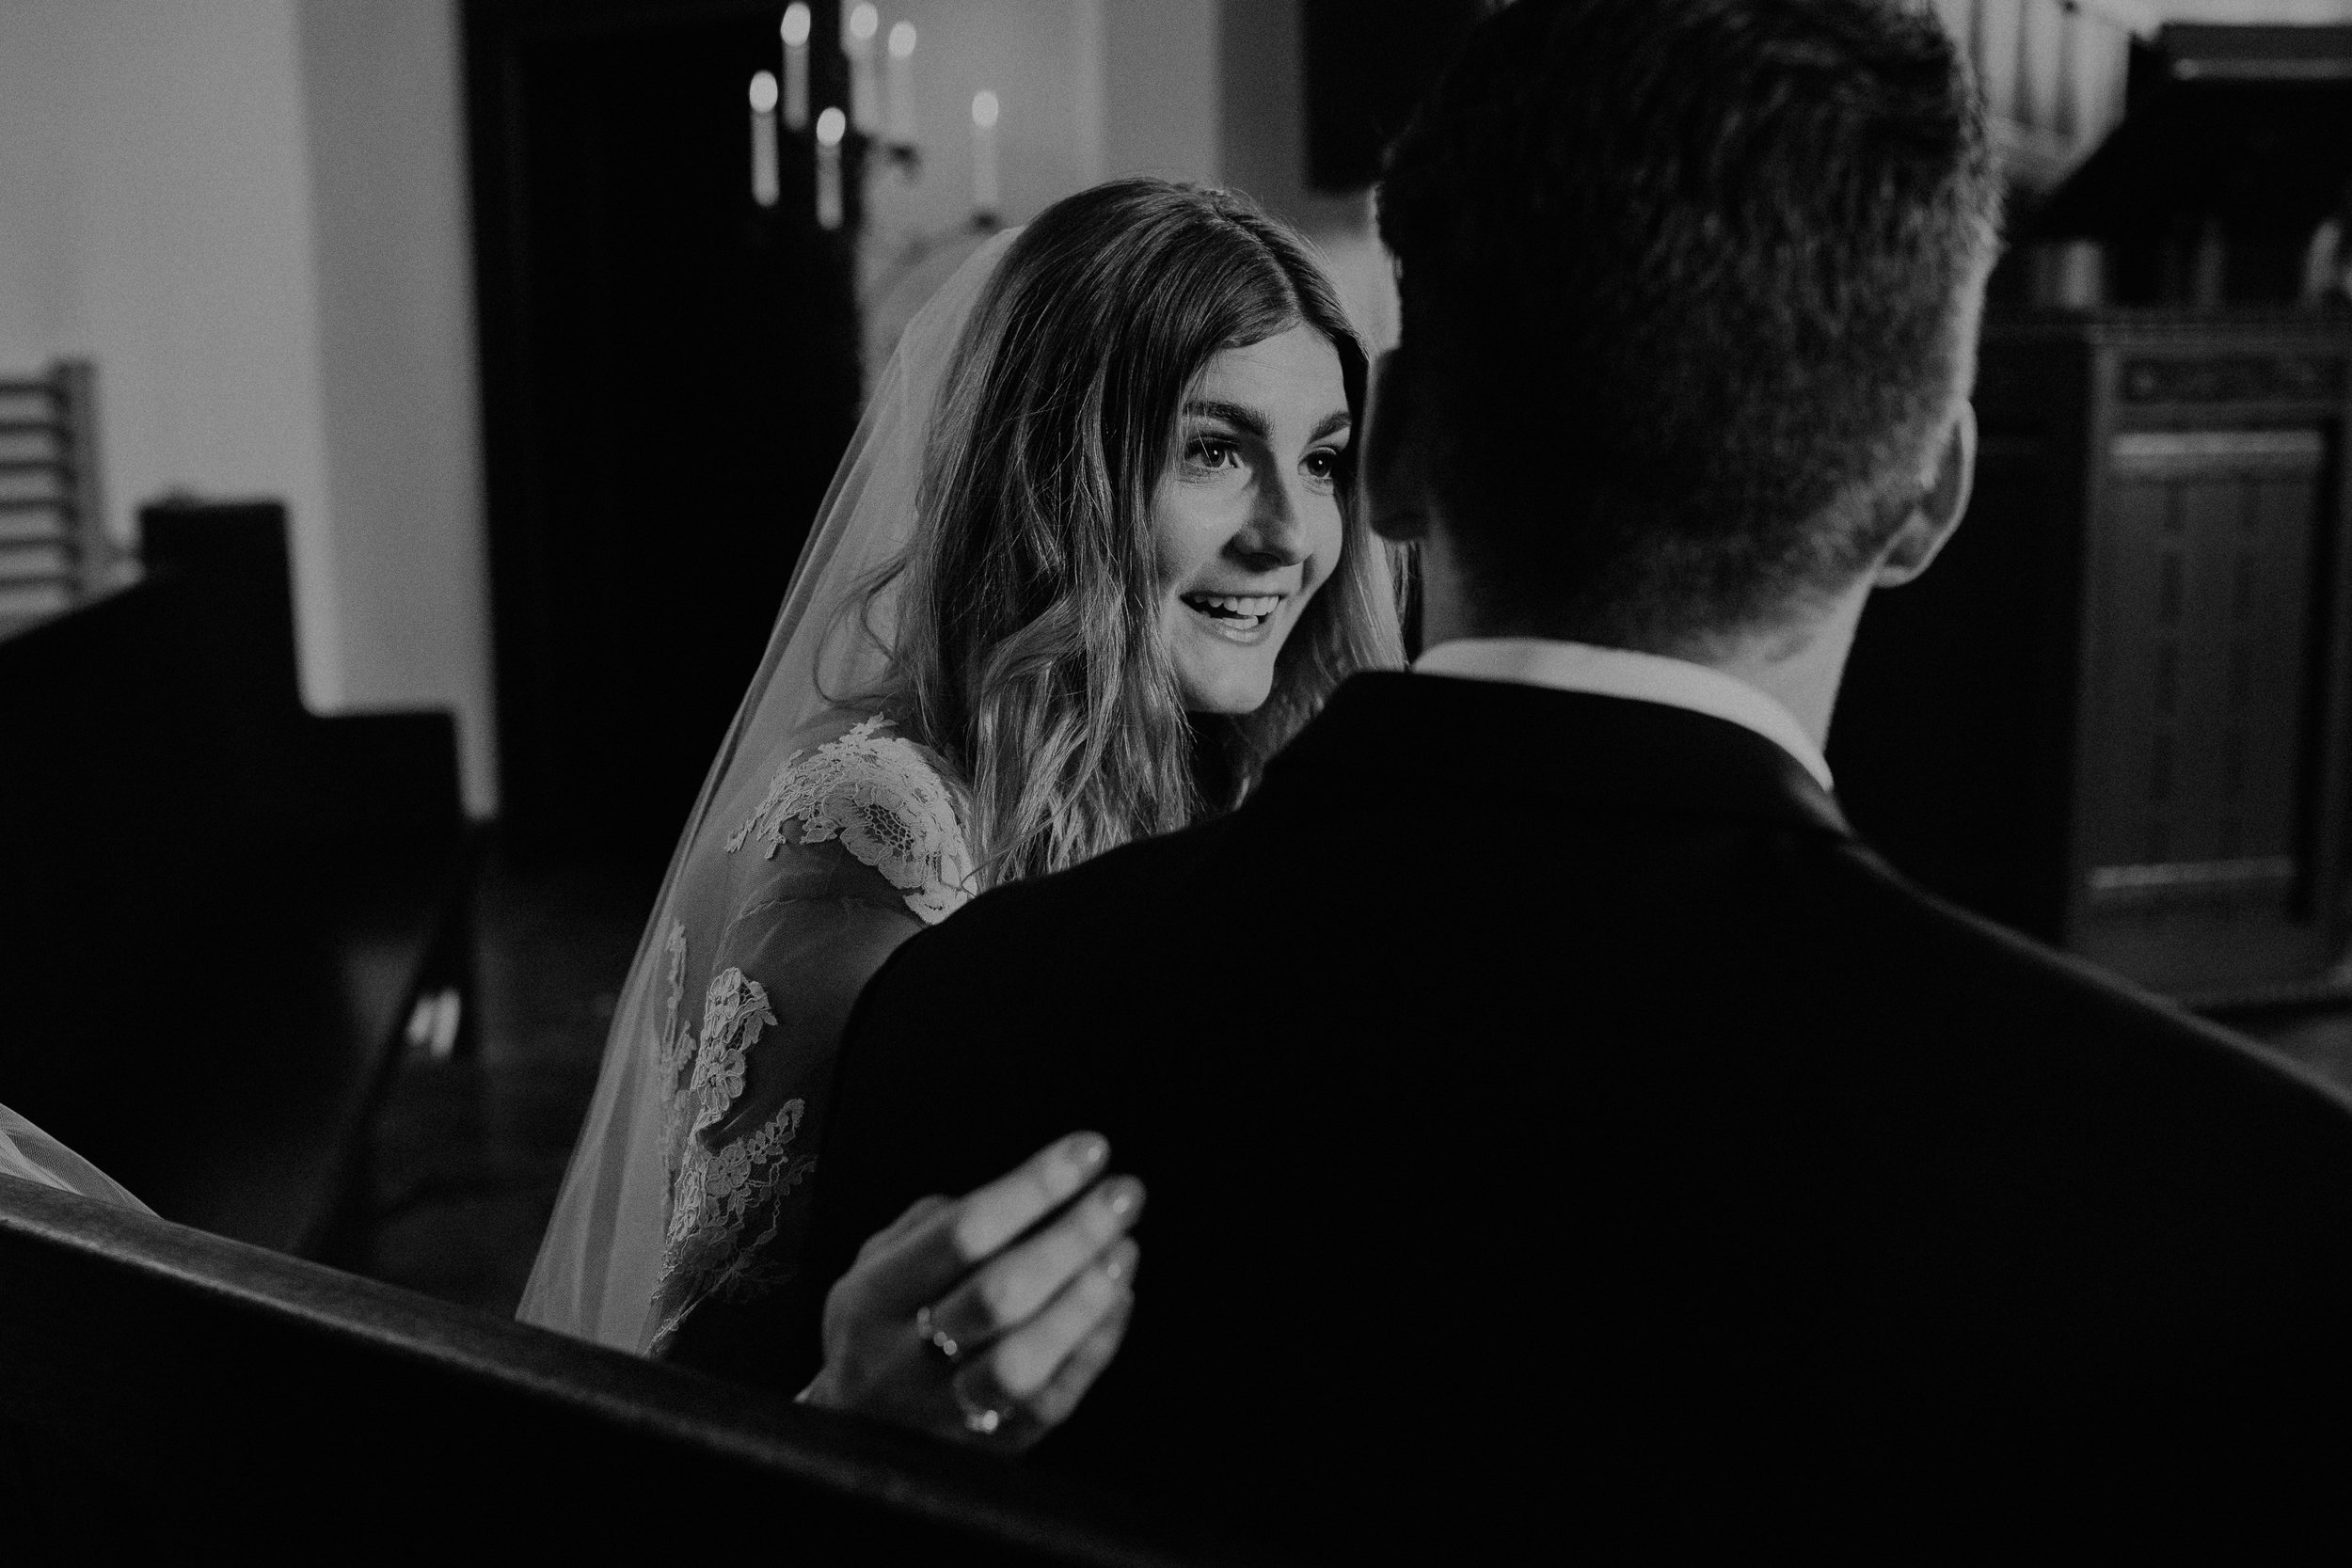 Mariemont_Chapel_Cincinnati_Wedding_Hannah_Nick-EDIT-381.JPG